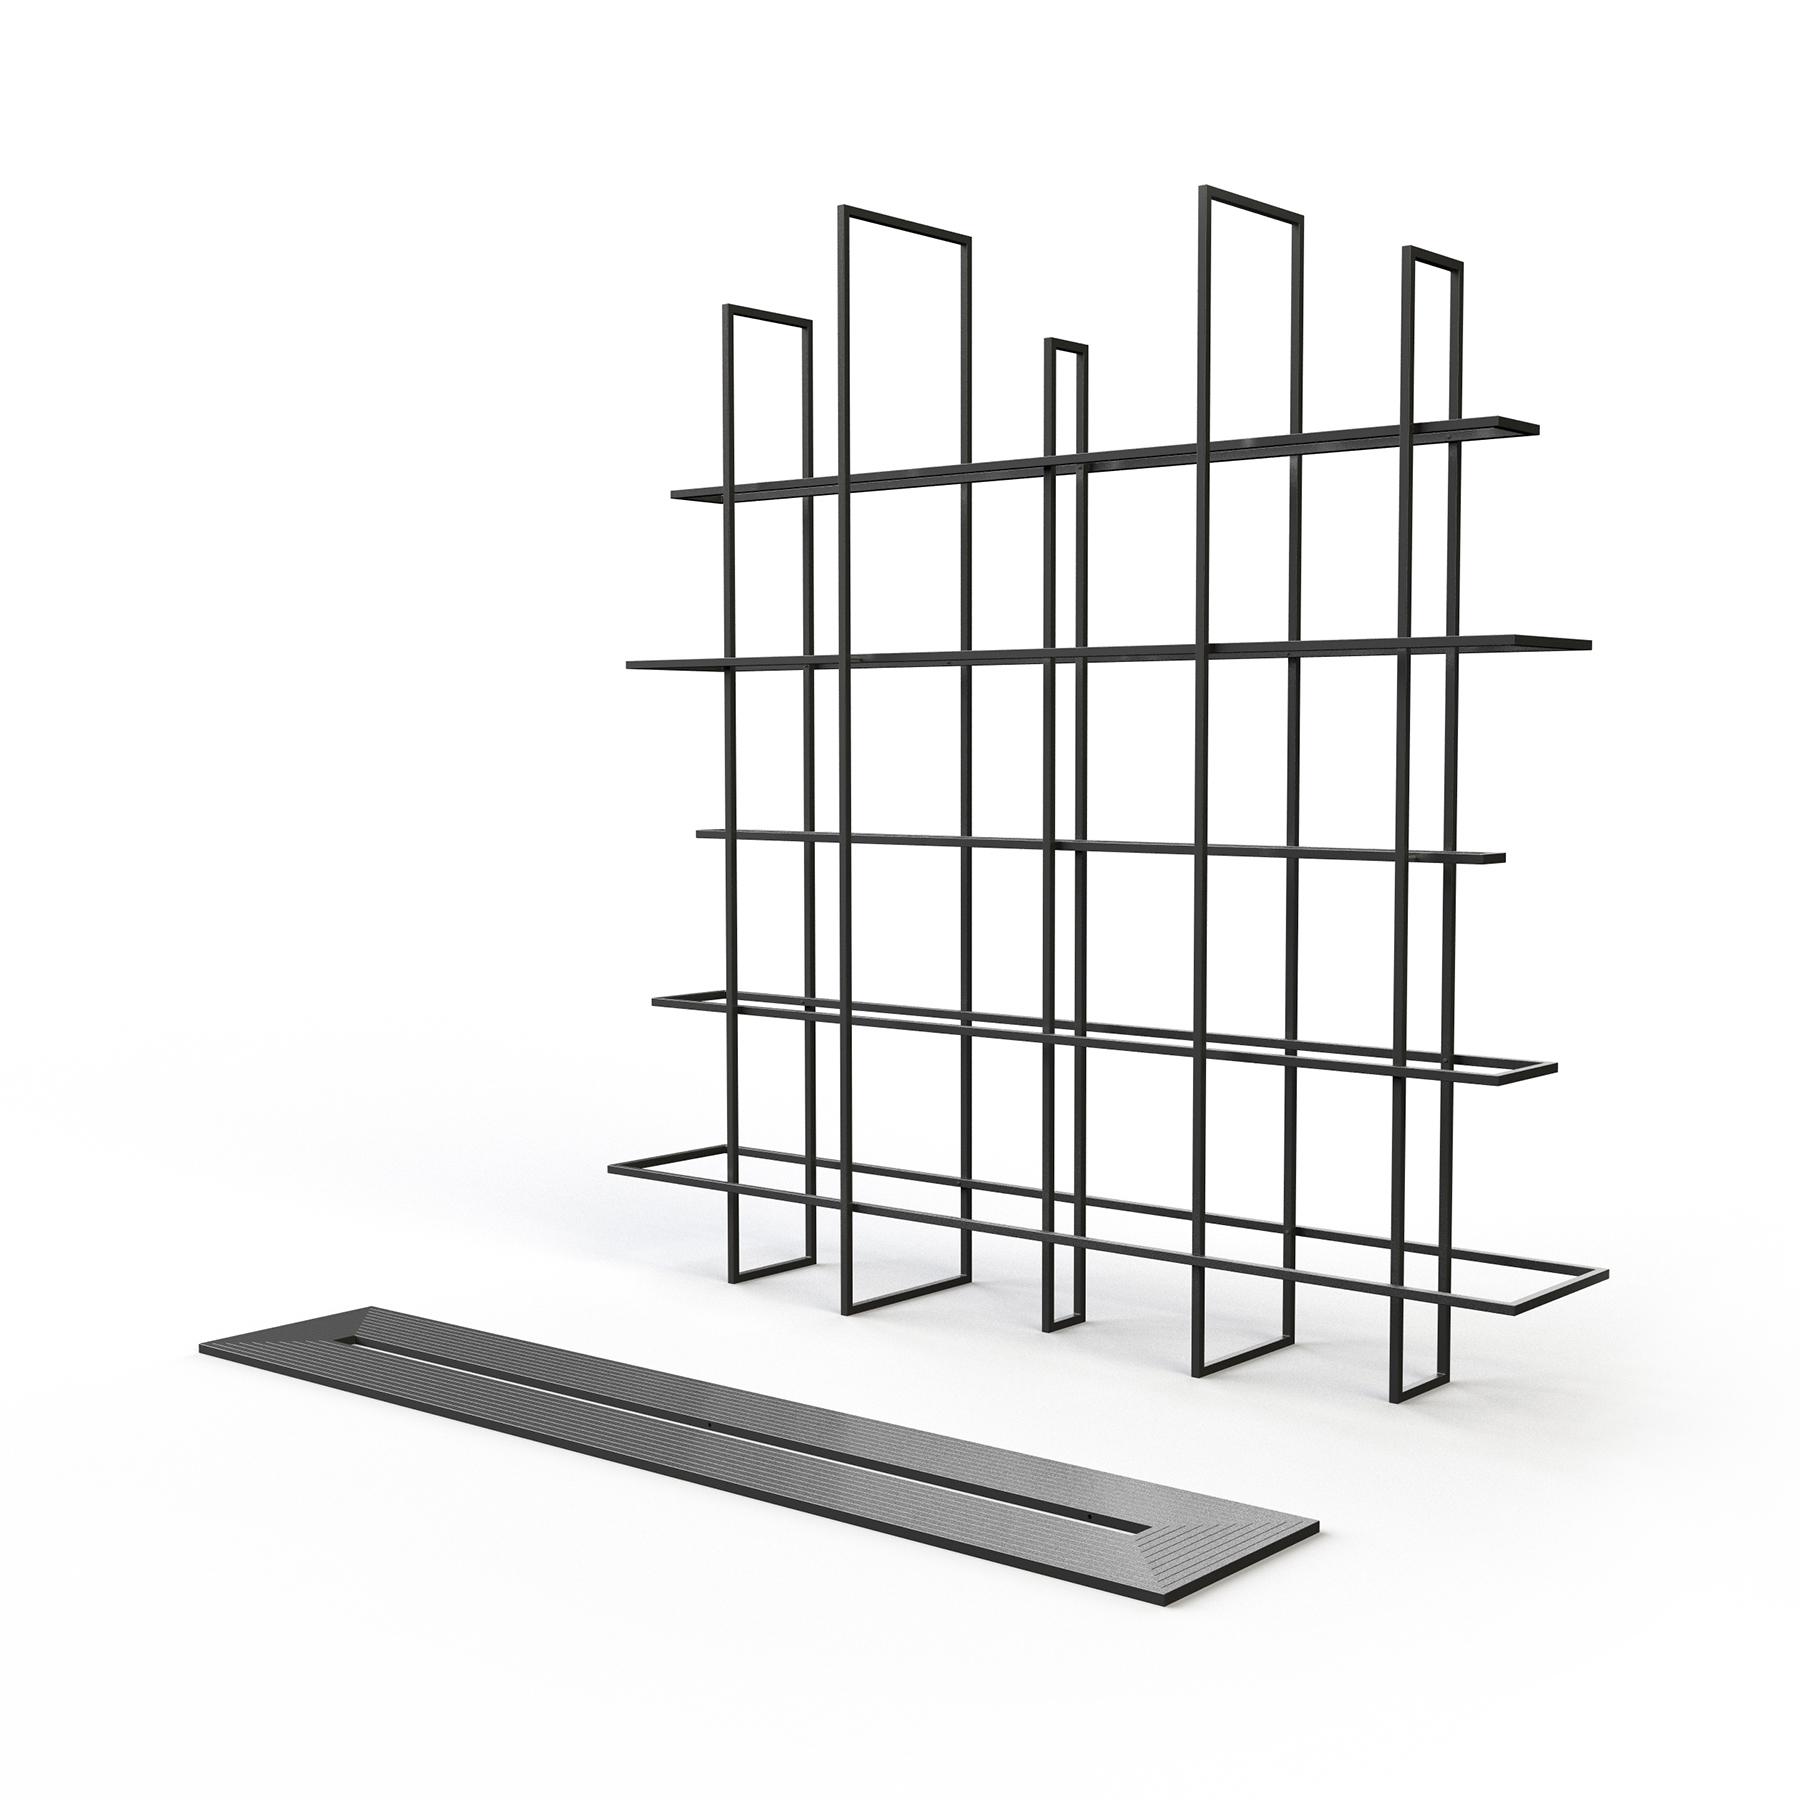 Frames 2.5 + package